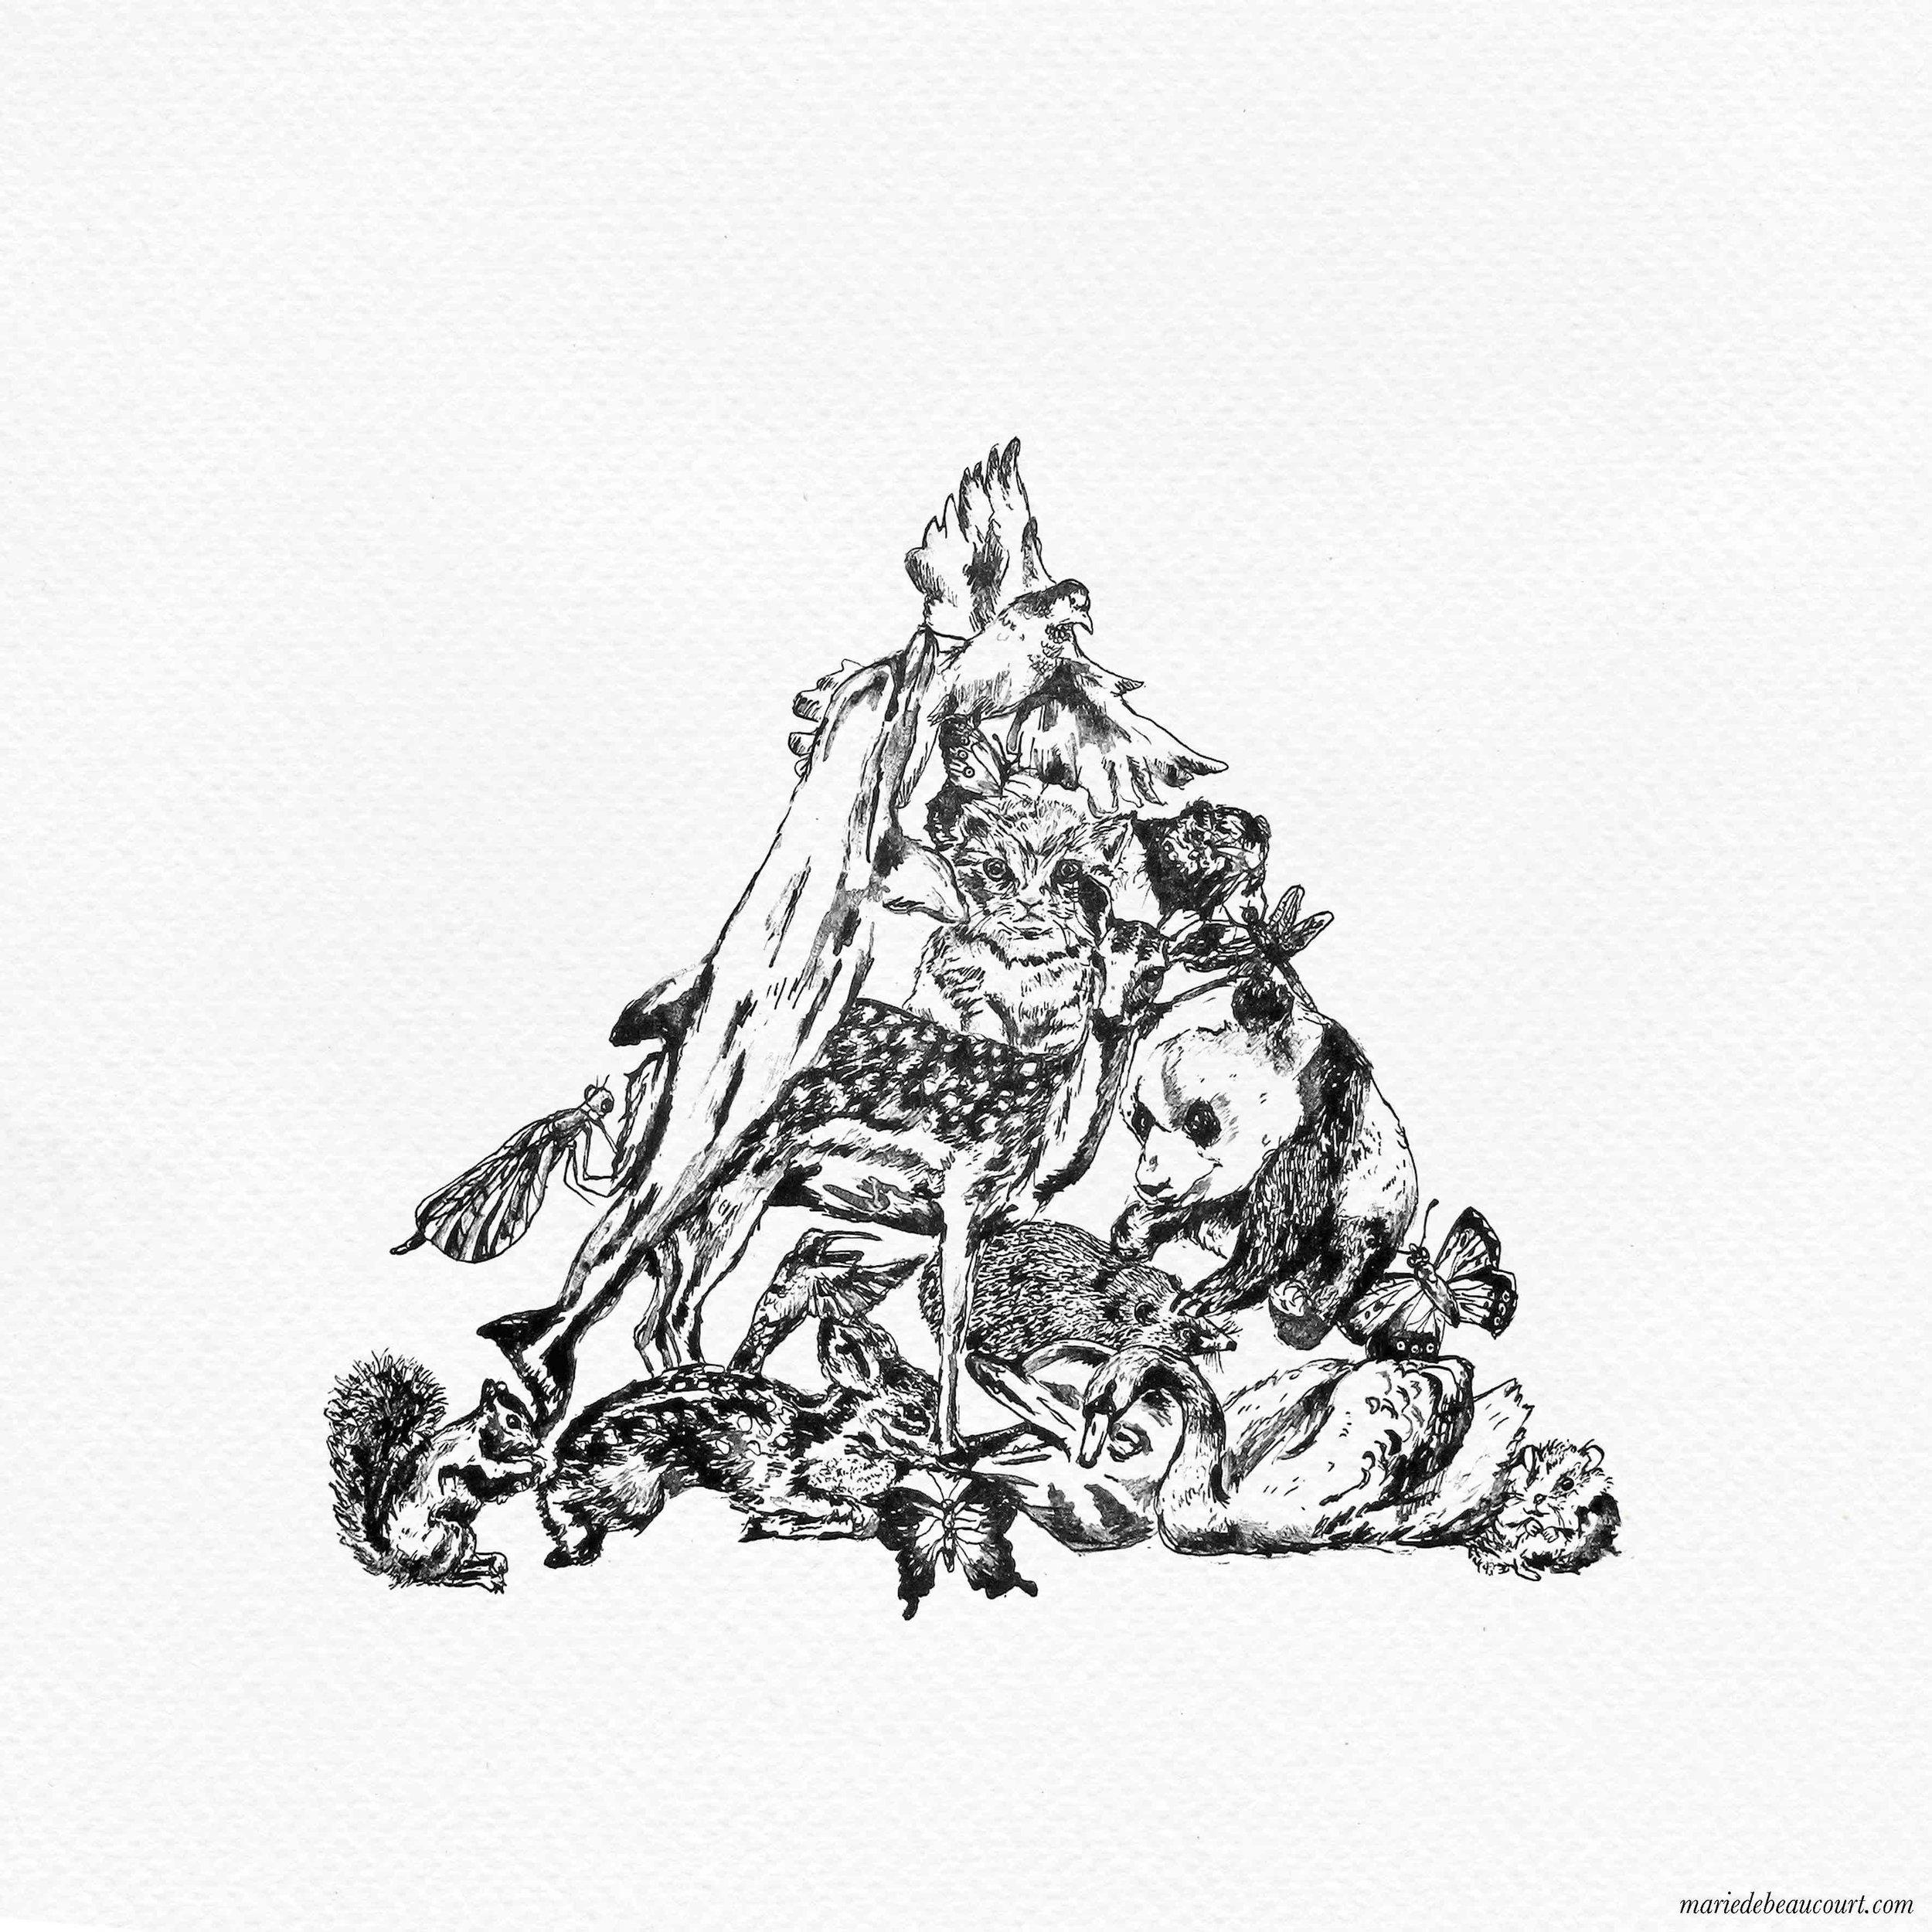 marie-de-beaucourt-illustration-animalia-triangle-preys-2017-web.jpg